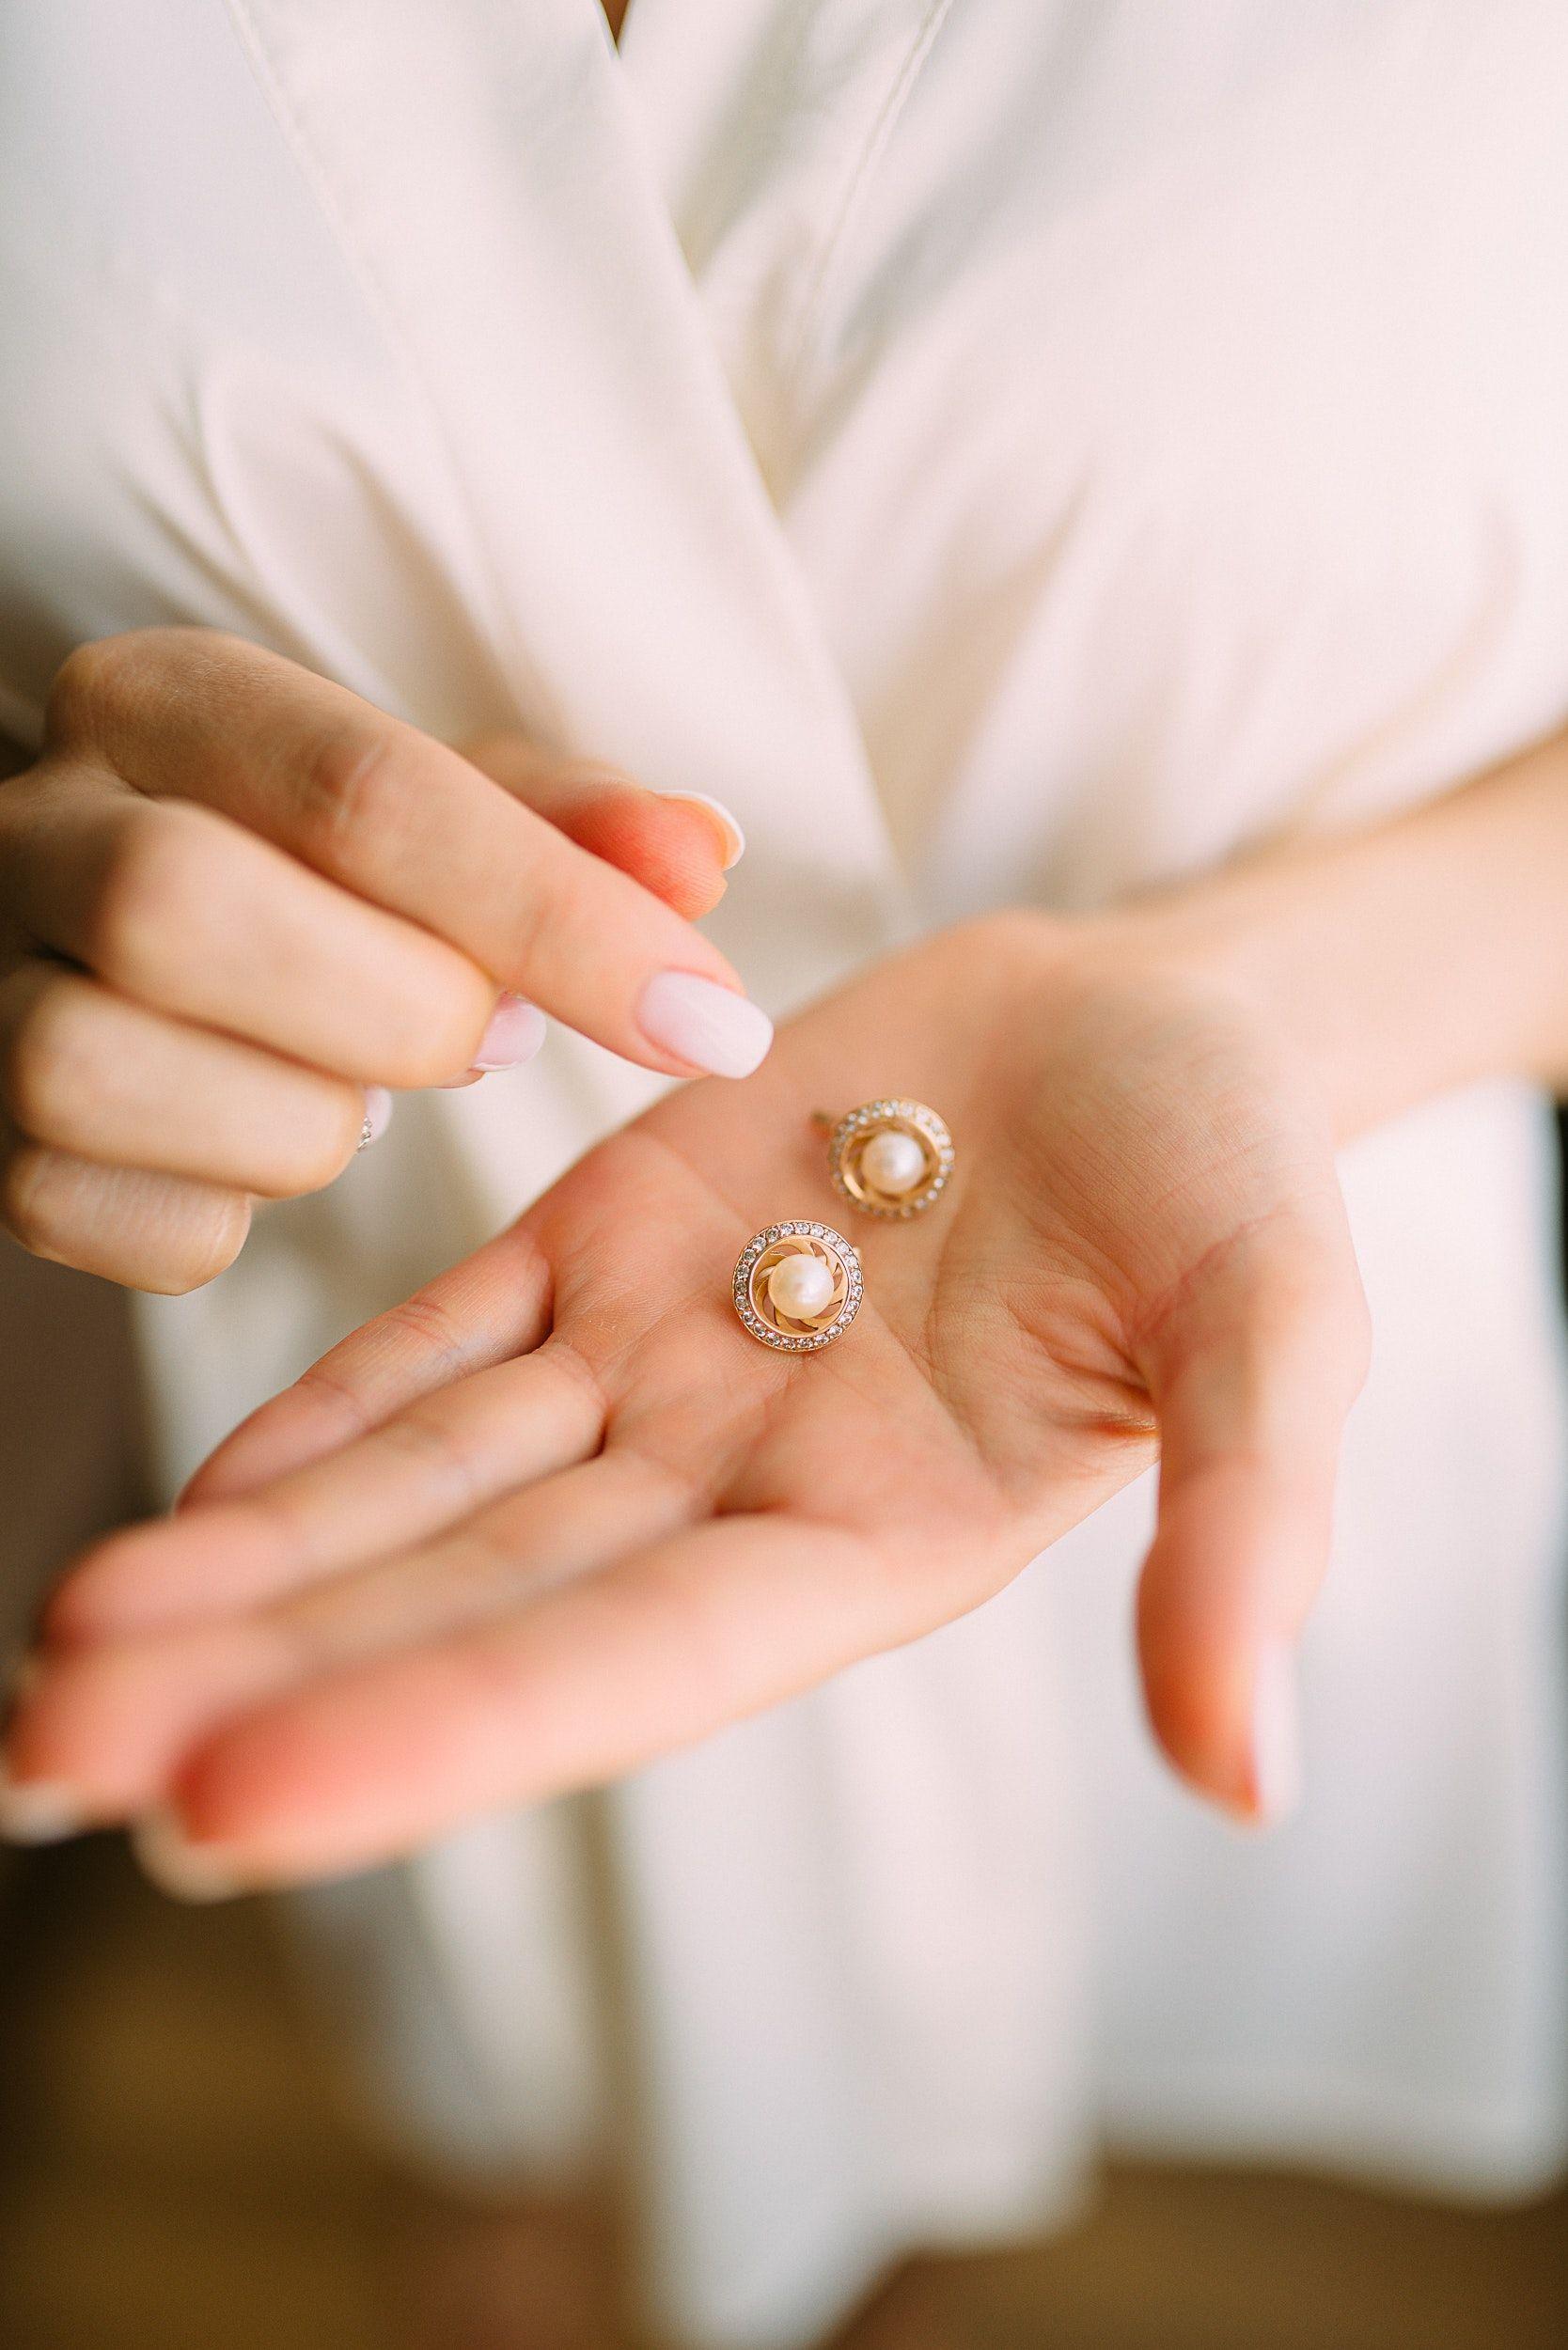 Family Heirlooms: Let Them Go or Cherish as a Treasured Keepsake?